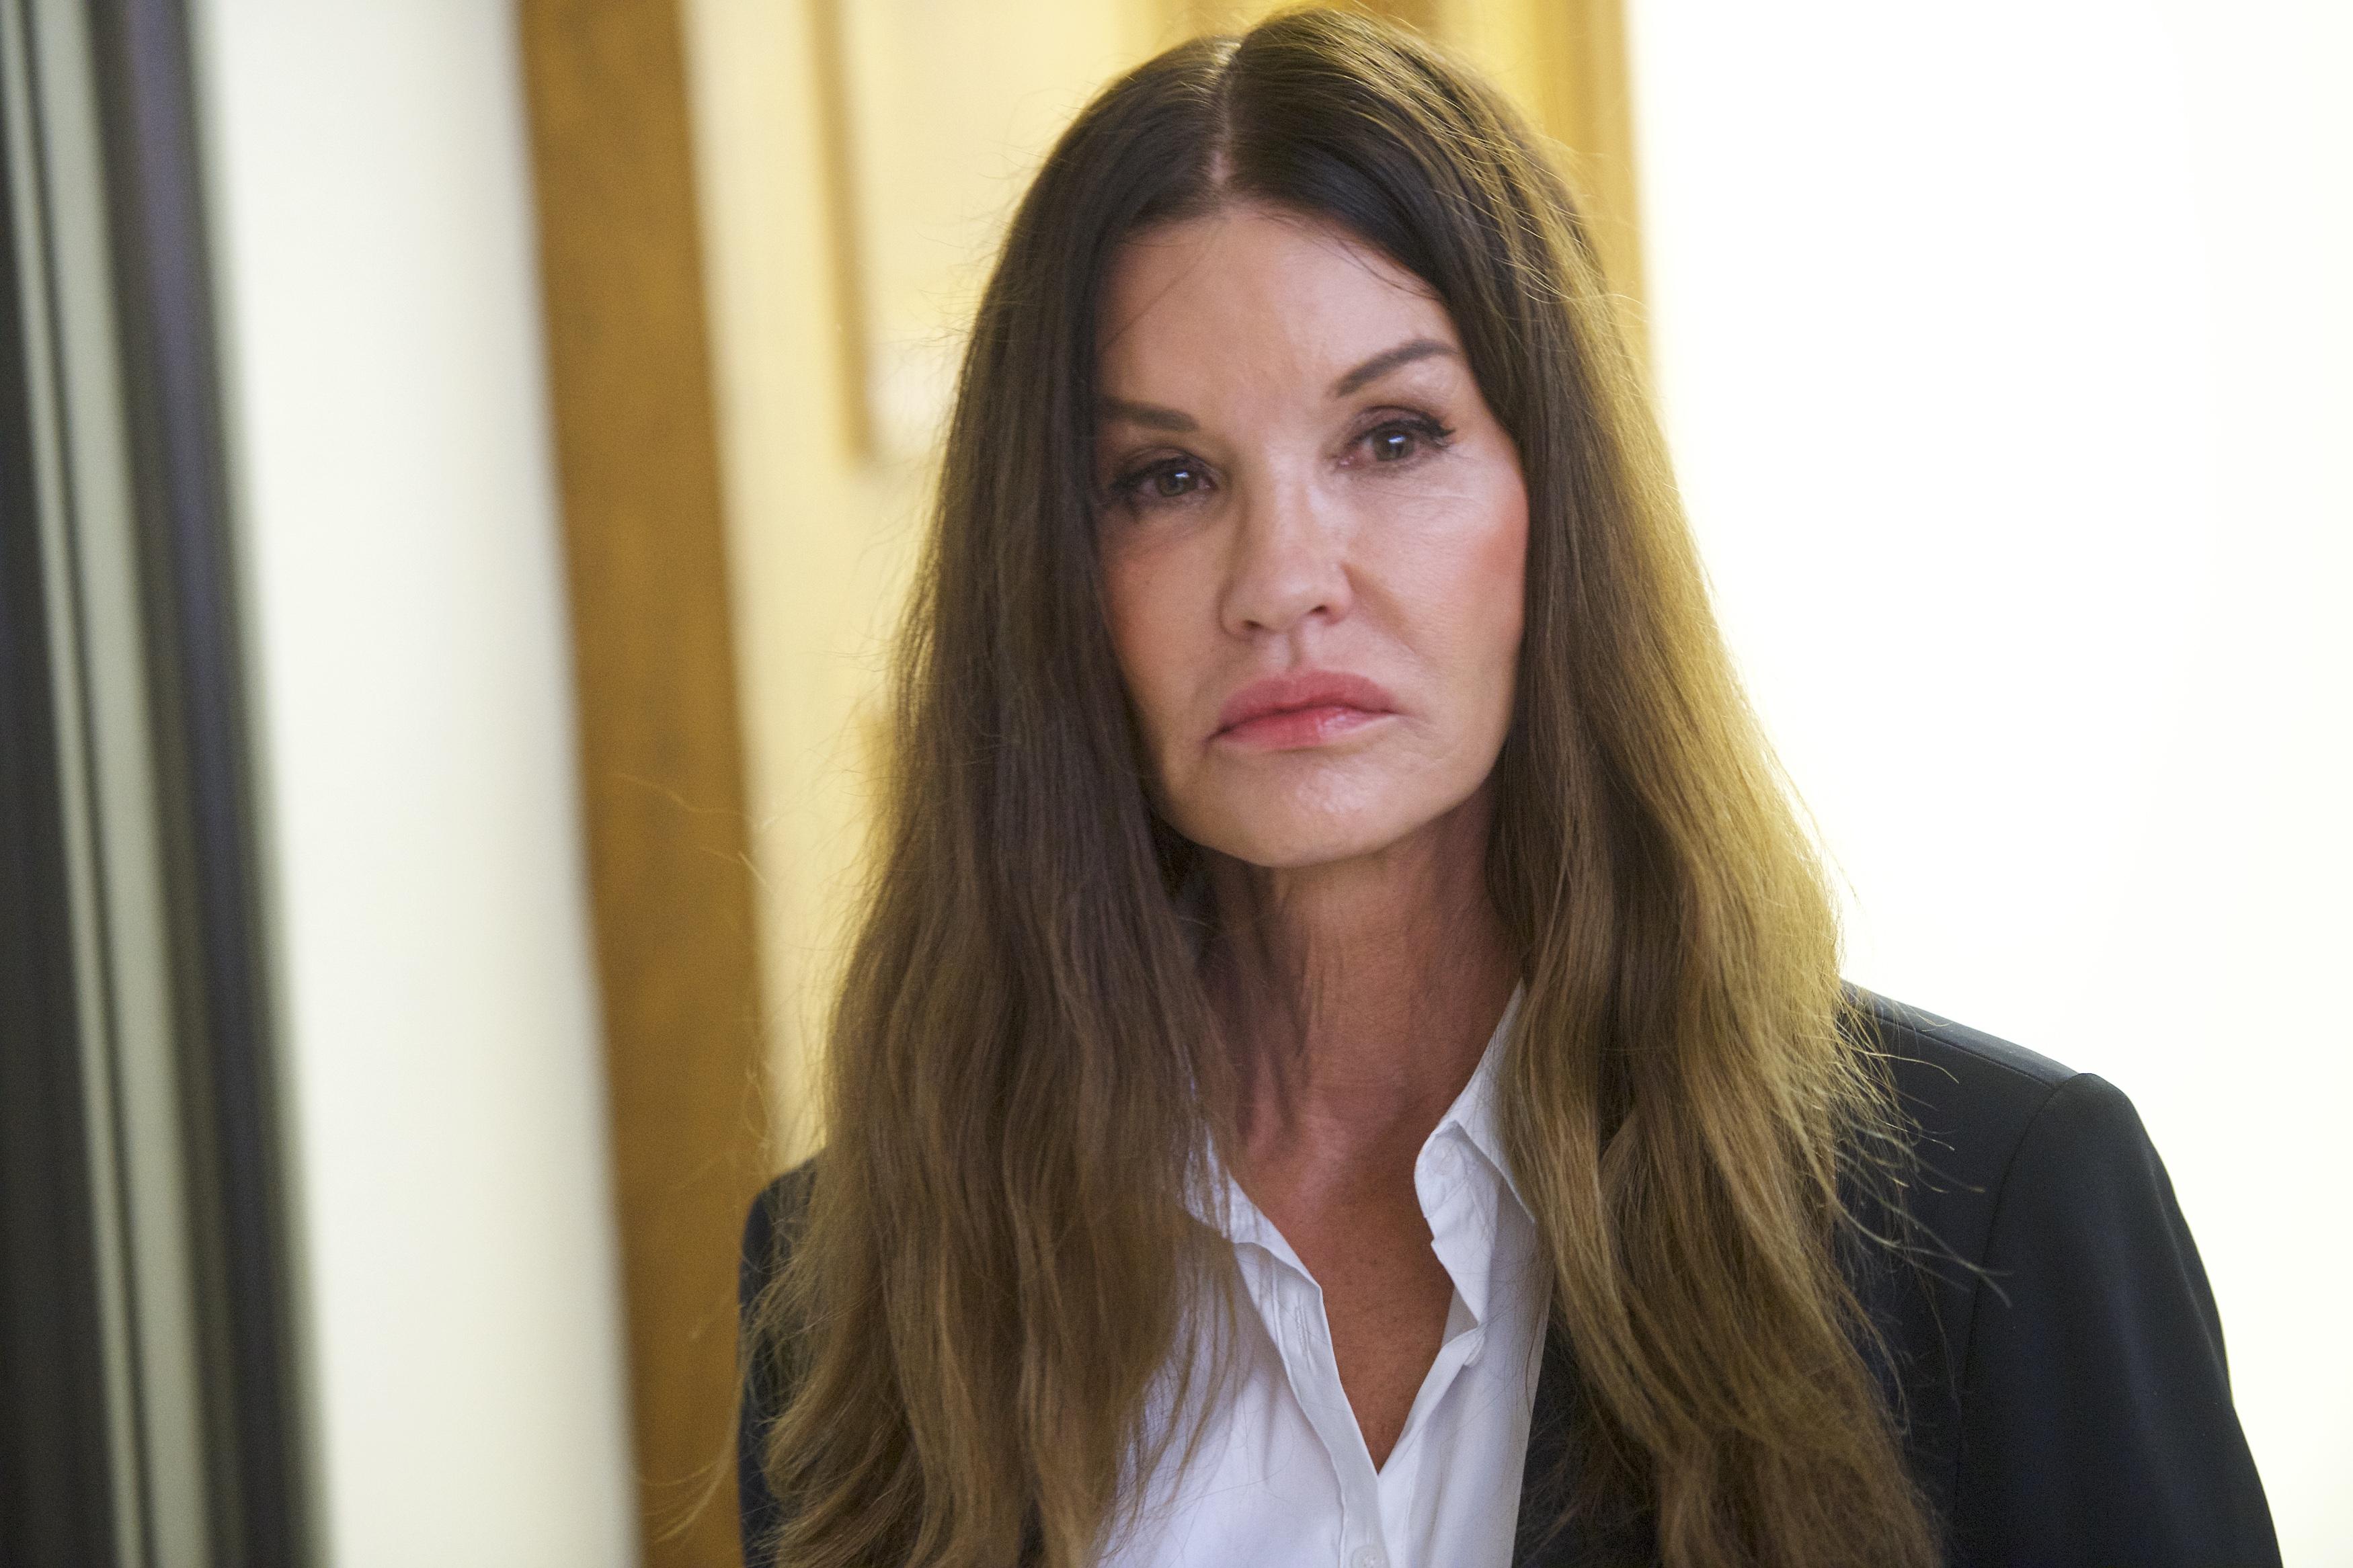 Model-Janice-Dickinson-Tells-Jury-That-Bill-Cosby-Raped-Her